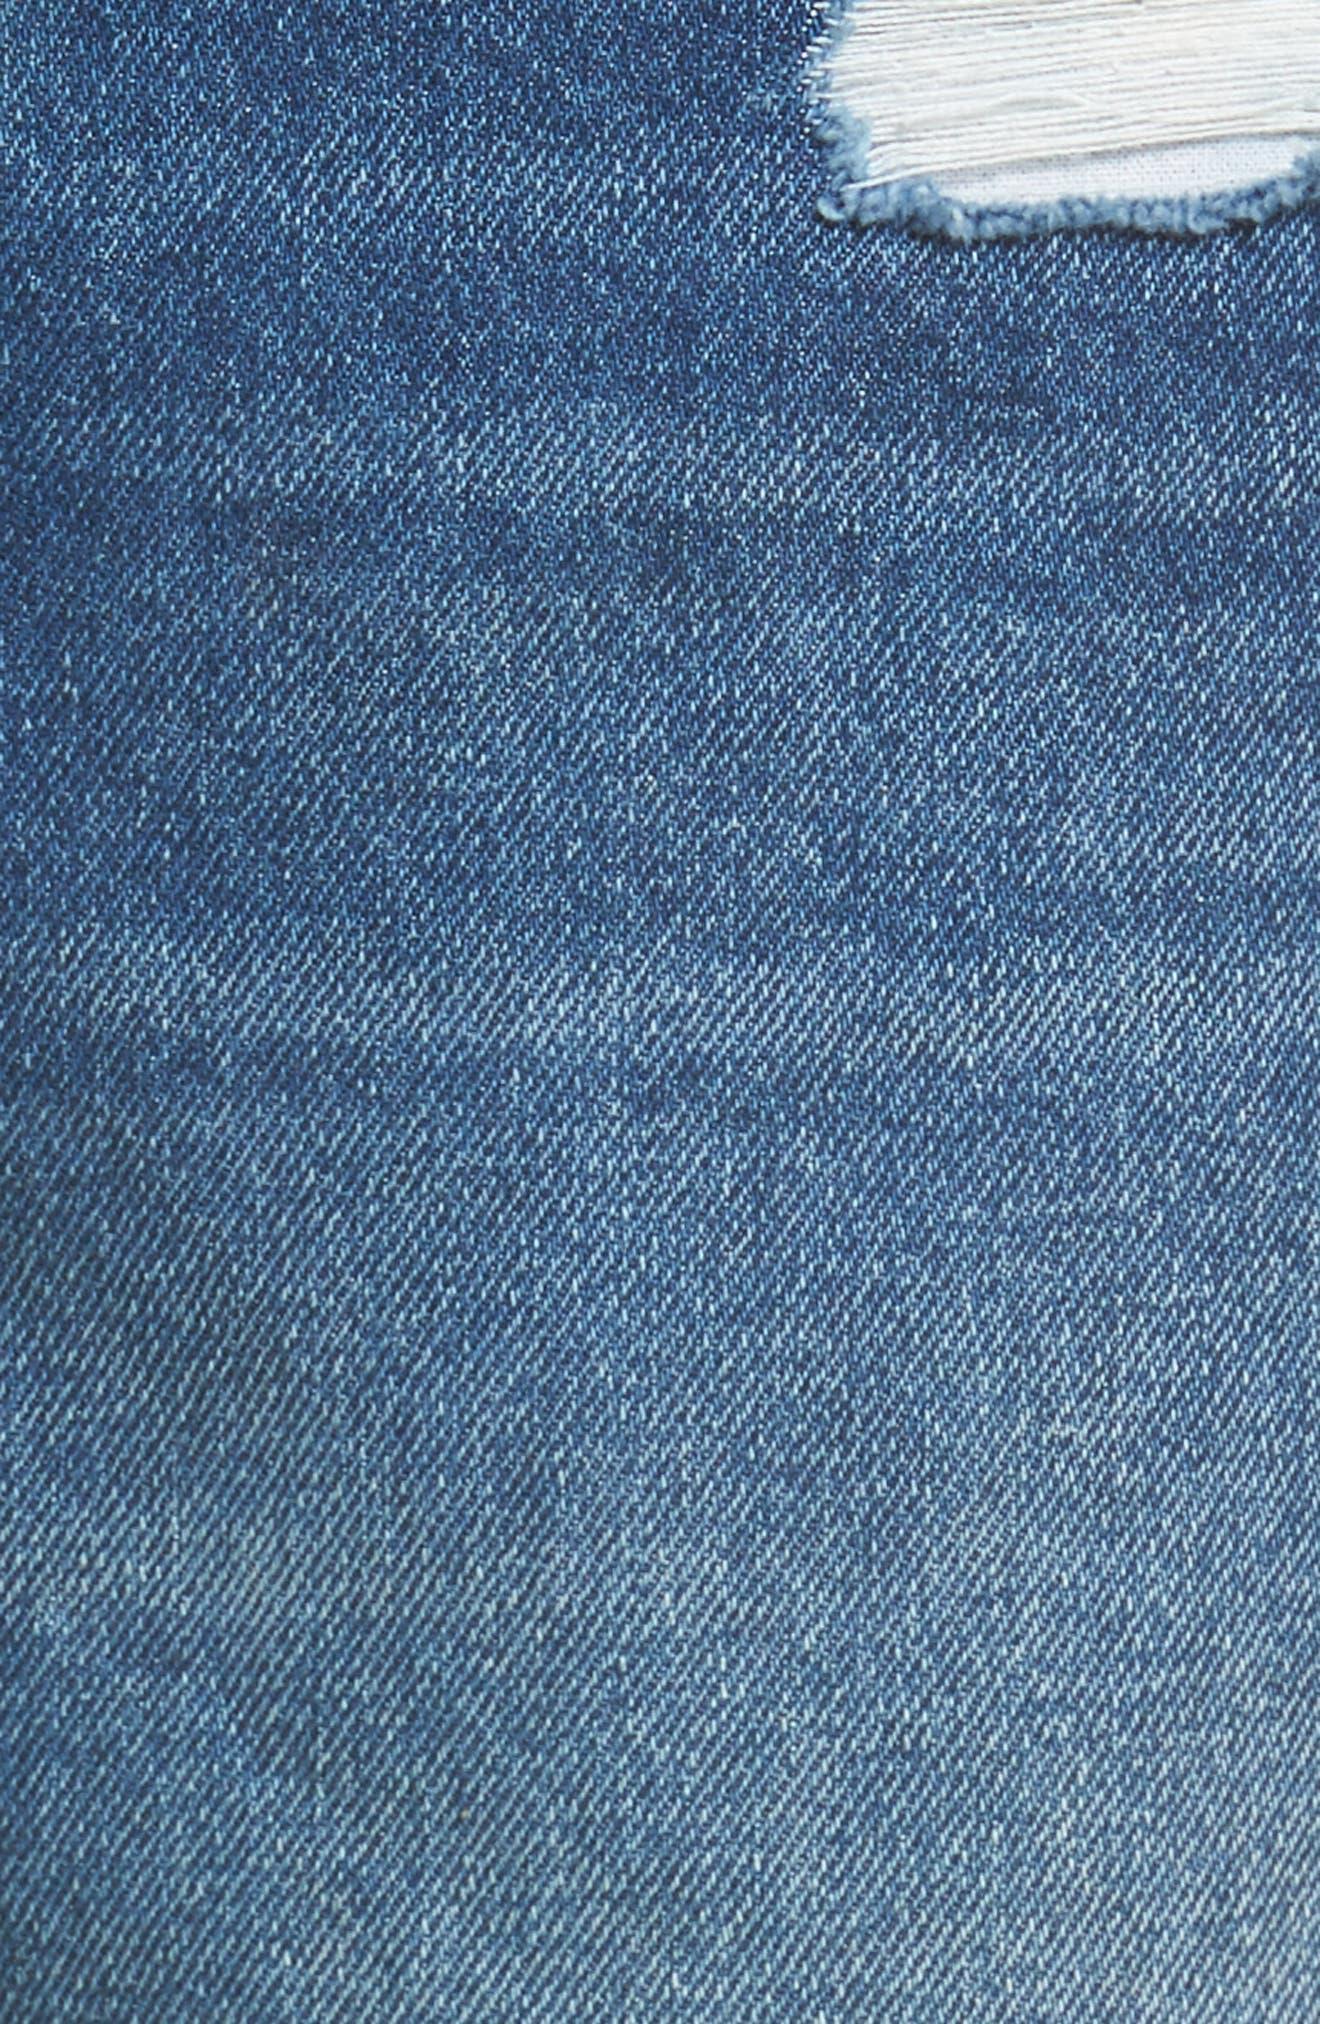 Embellished Straight Leg Jeans,                             Alternate thumbnail 5, color,                             400